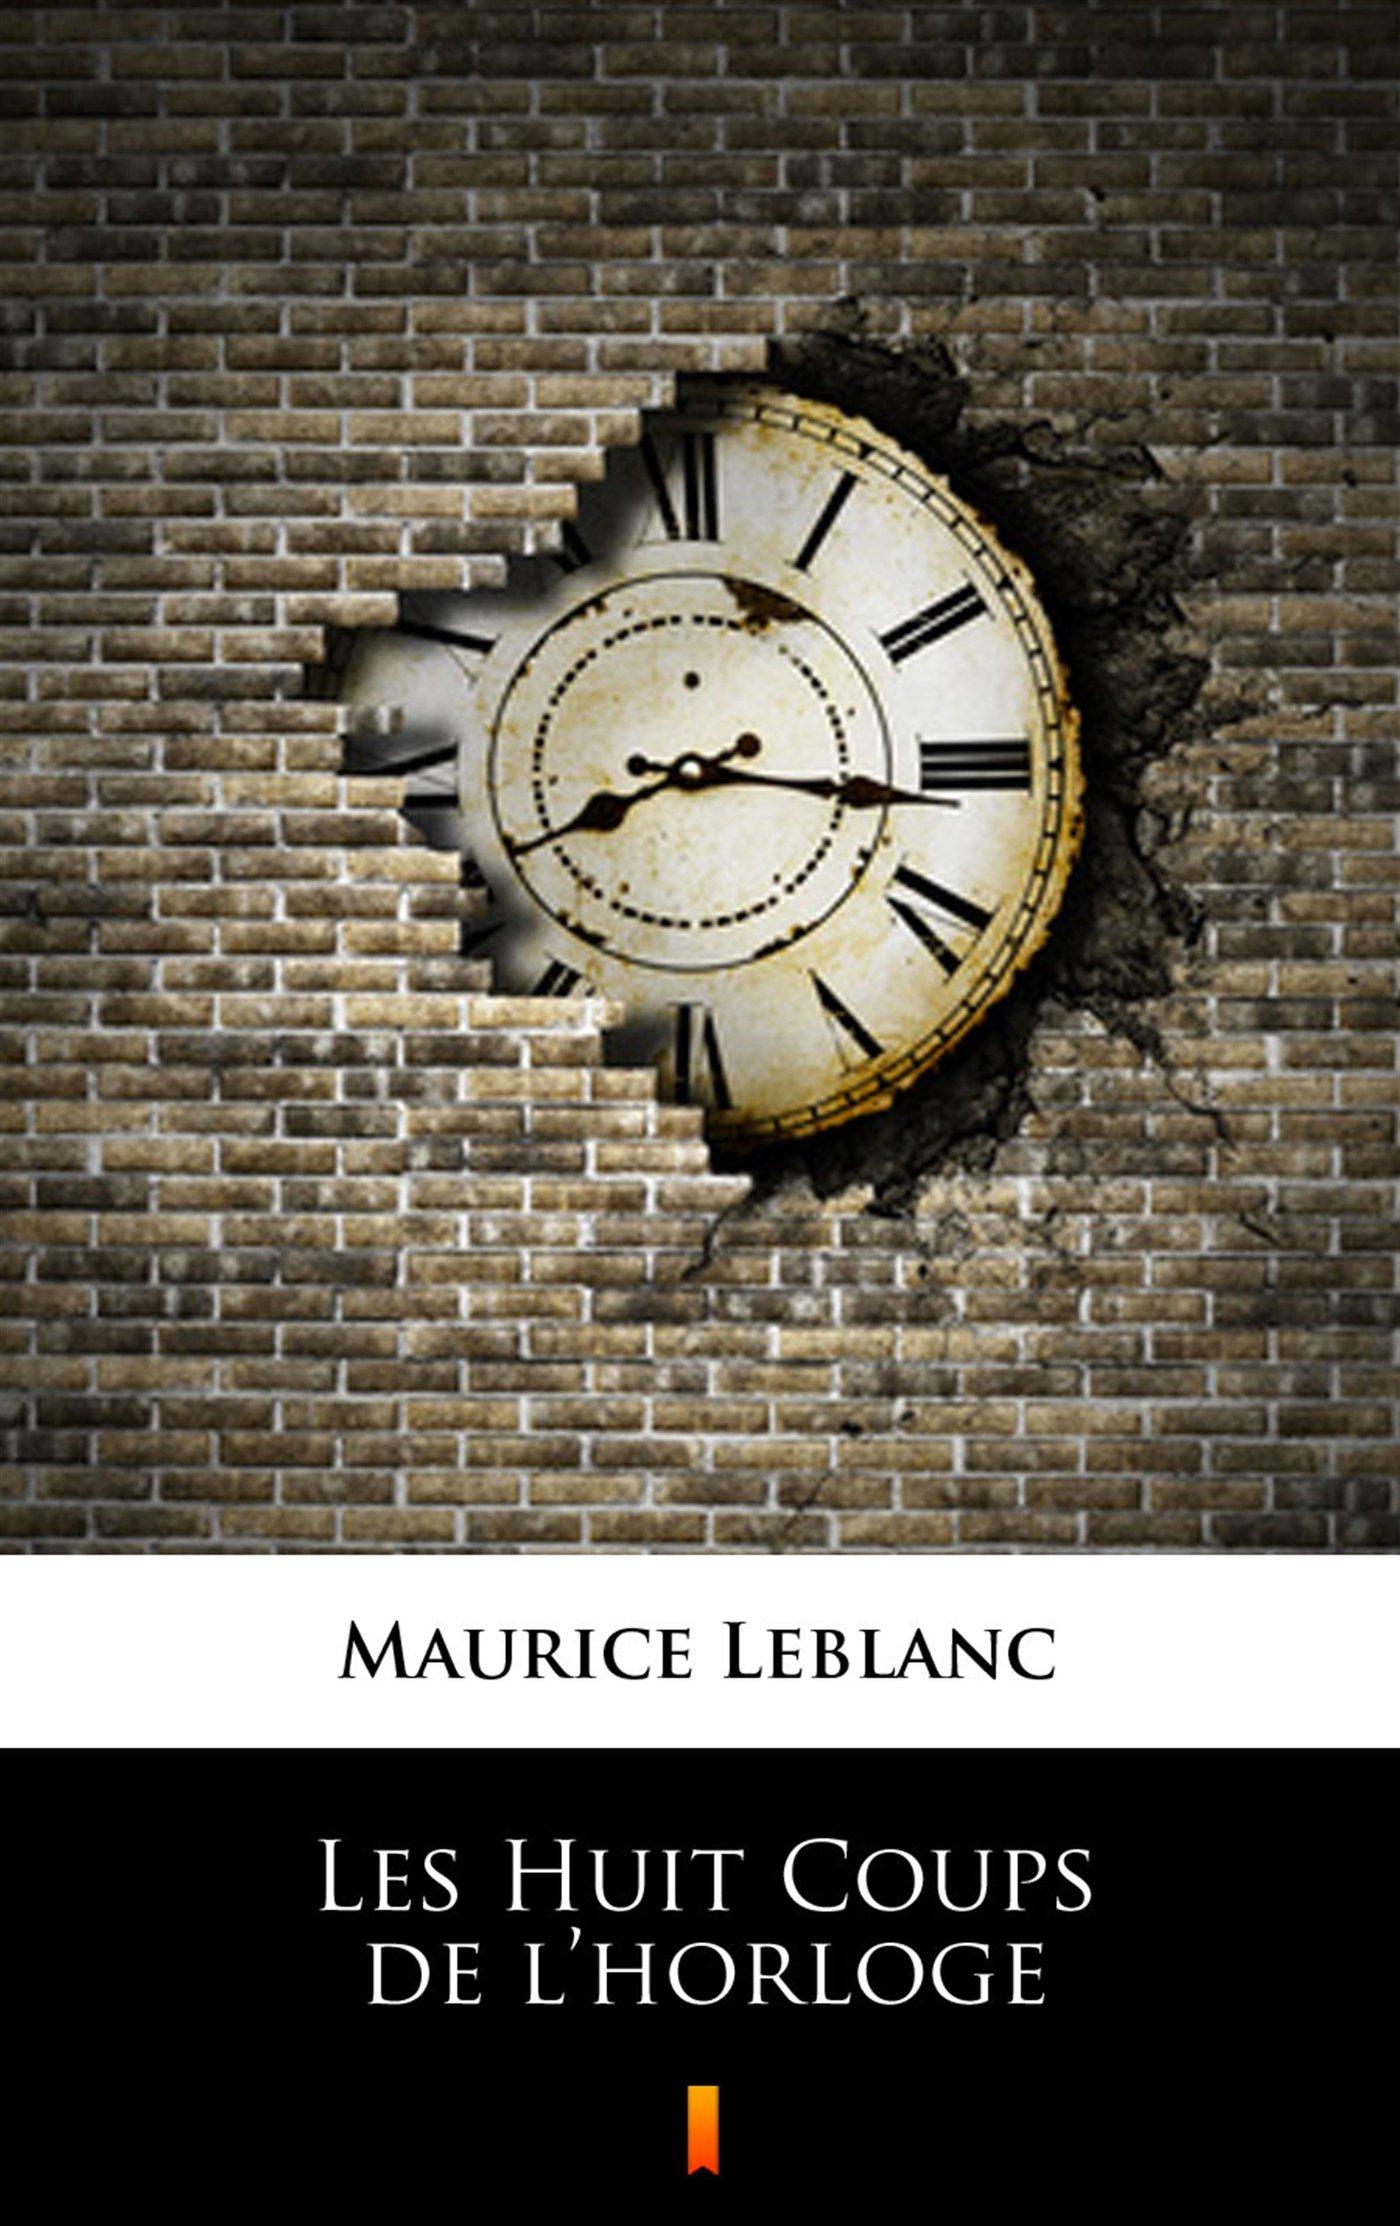 Les Huit Coups de l horloge - Ebook (Książka EPUB) do pobrania w formacie EPUB